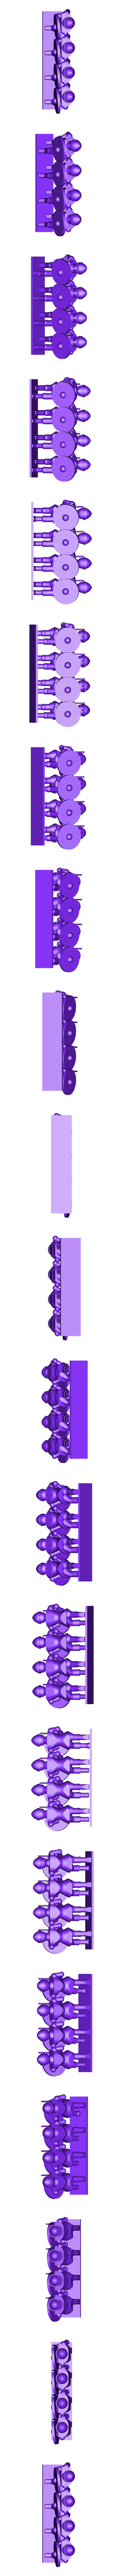 swordmen1.stl Download free STL file Generic Sword'n'Board 28mm figures • 3D printer model, Earsling